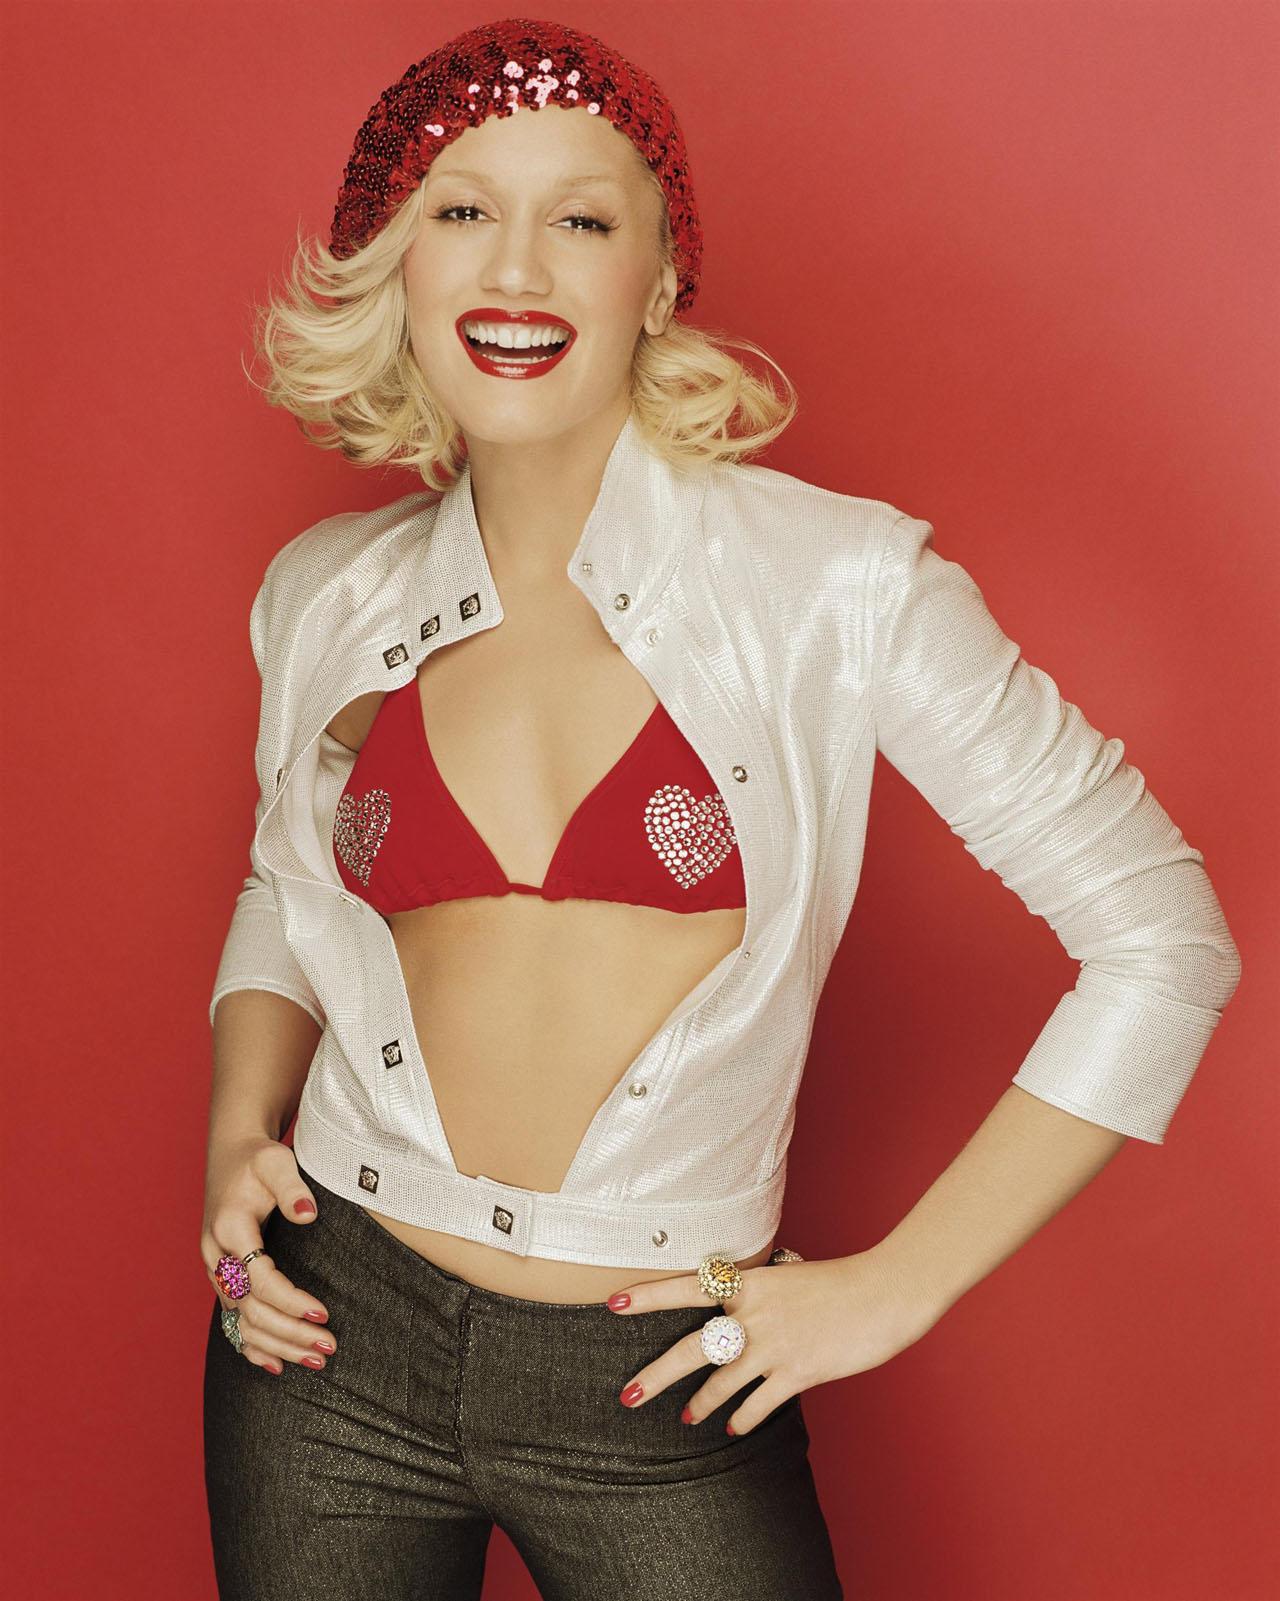 Gwen Stefani NUE - Starsapoilcom - People et stars nues